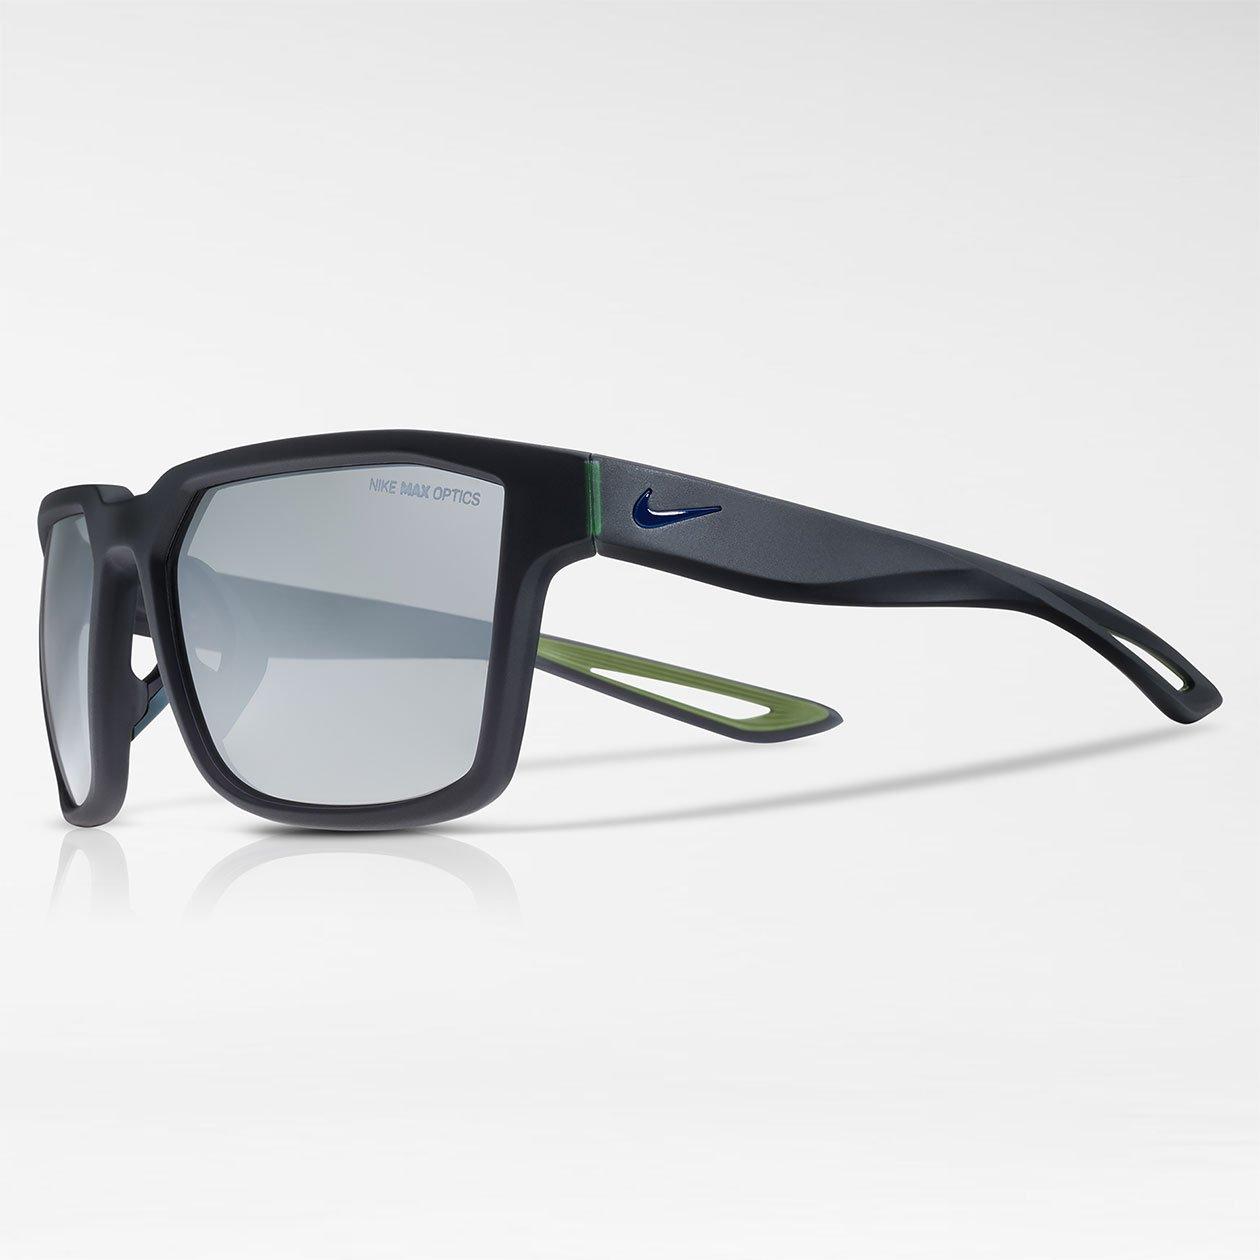 e02c39808e Nike Fleet EV0992 011 55, Gafas de Sol Unisex, Mtt Blck/Gry Slvr